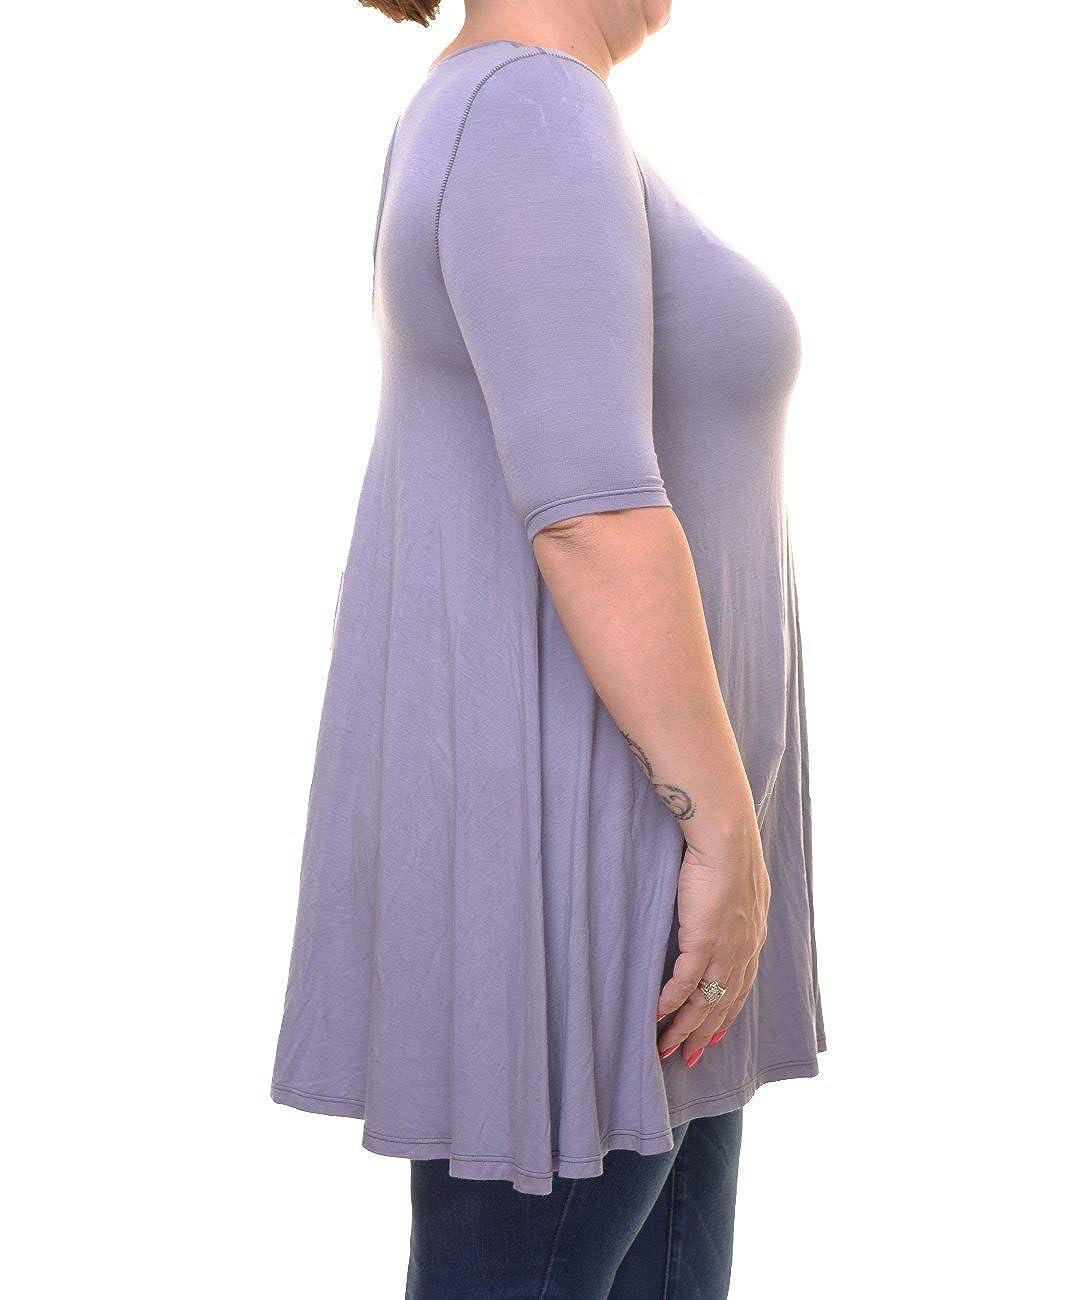 Free People Jacqueline Elbow-Sleeve Tunic